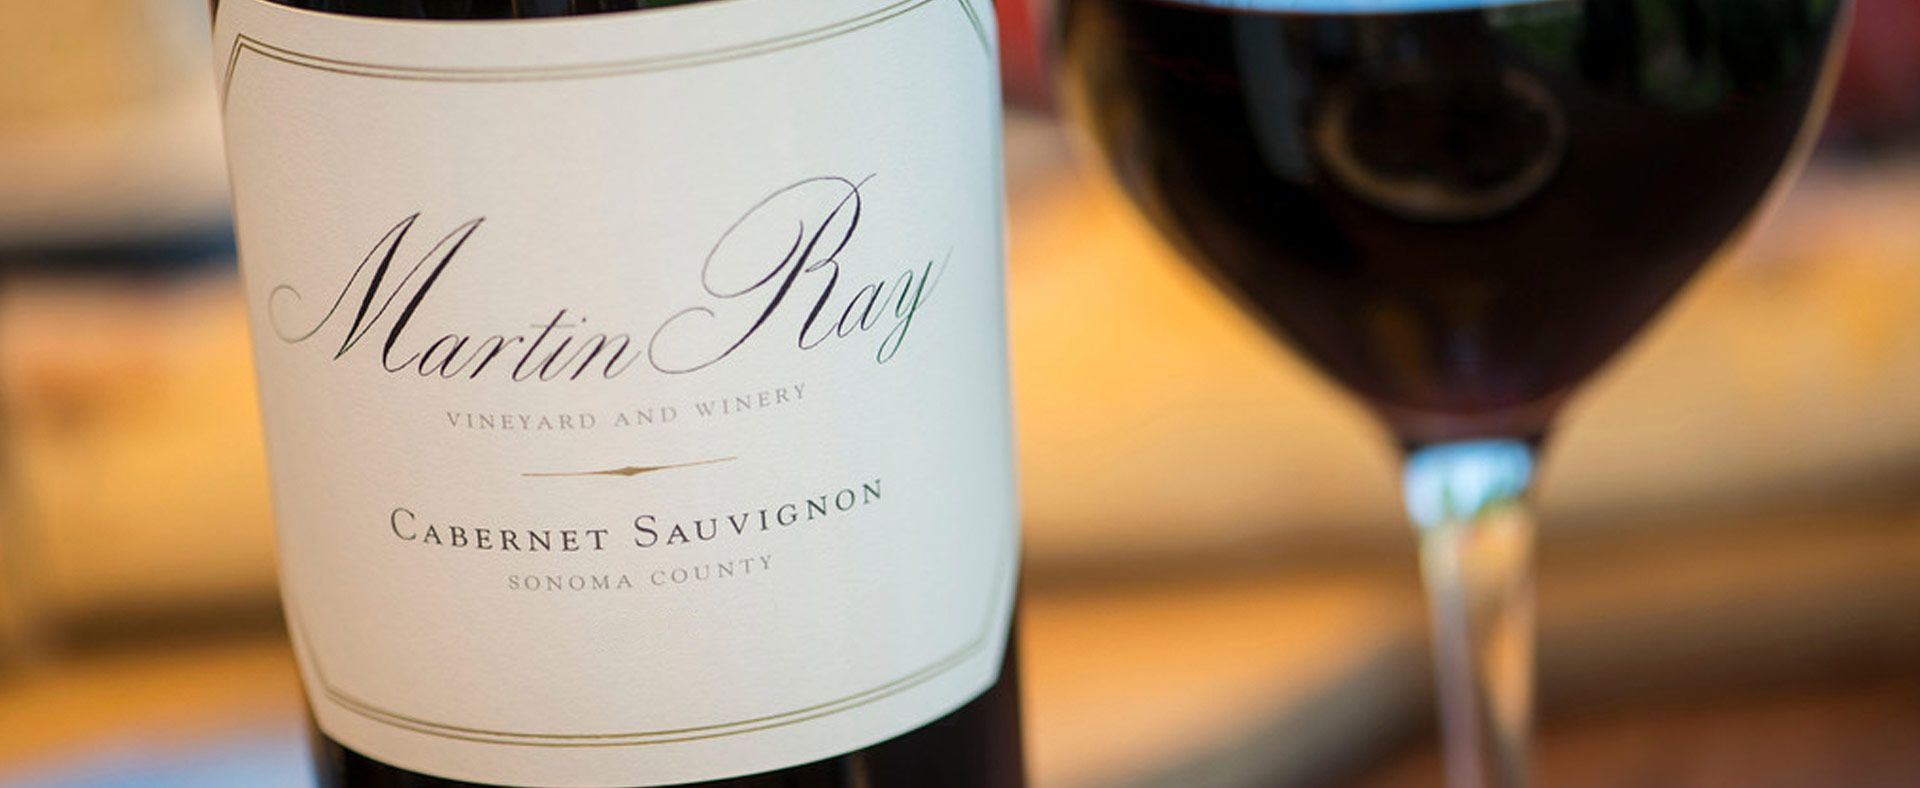 Martin Ray Winery - an early CapaBunga adopter | Sonoma county wineries,  Winery, California winery